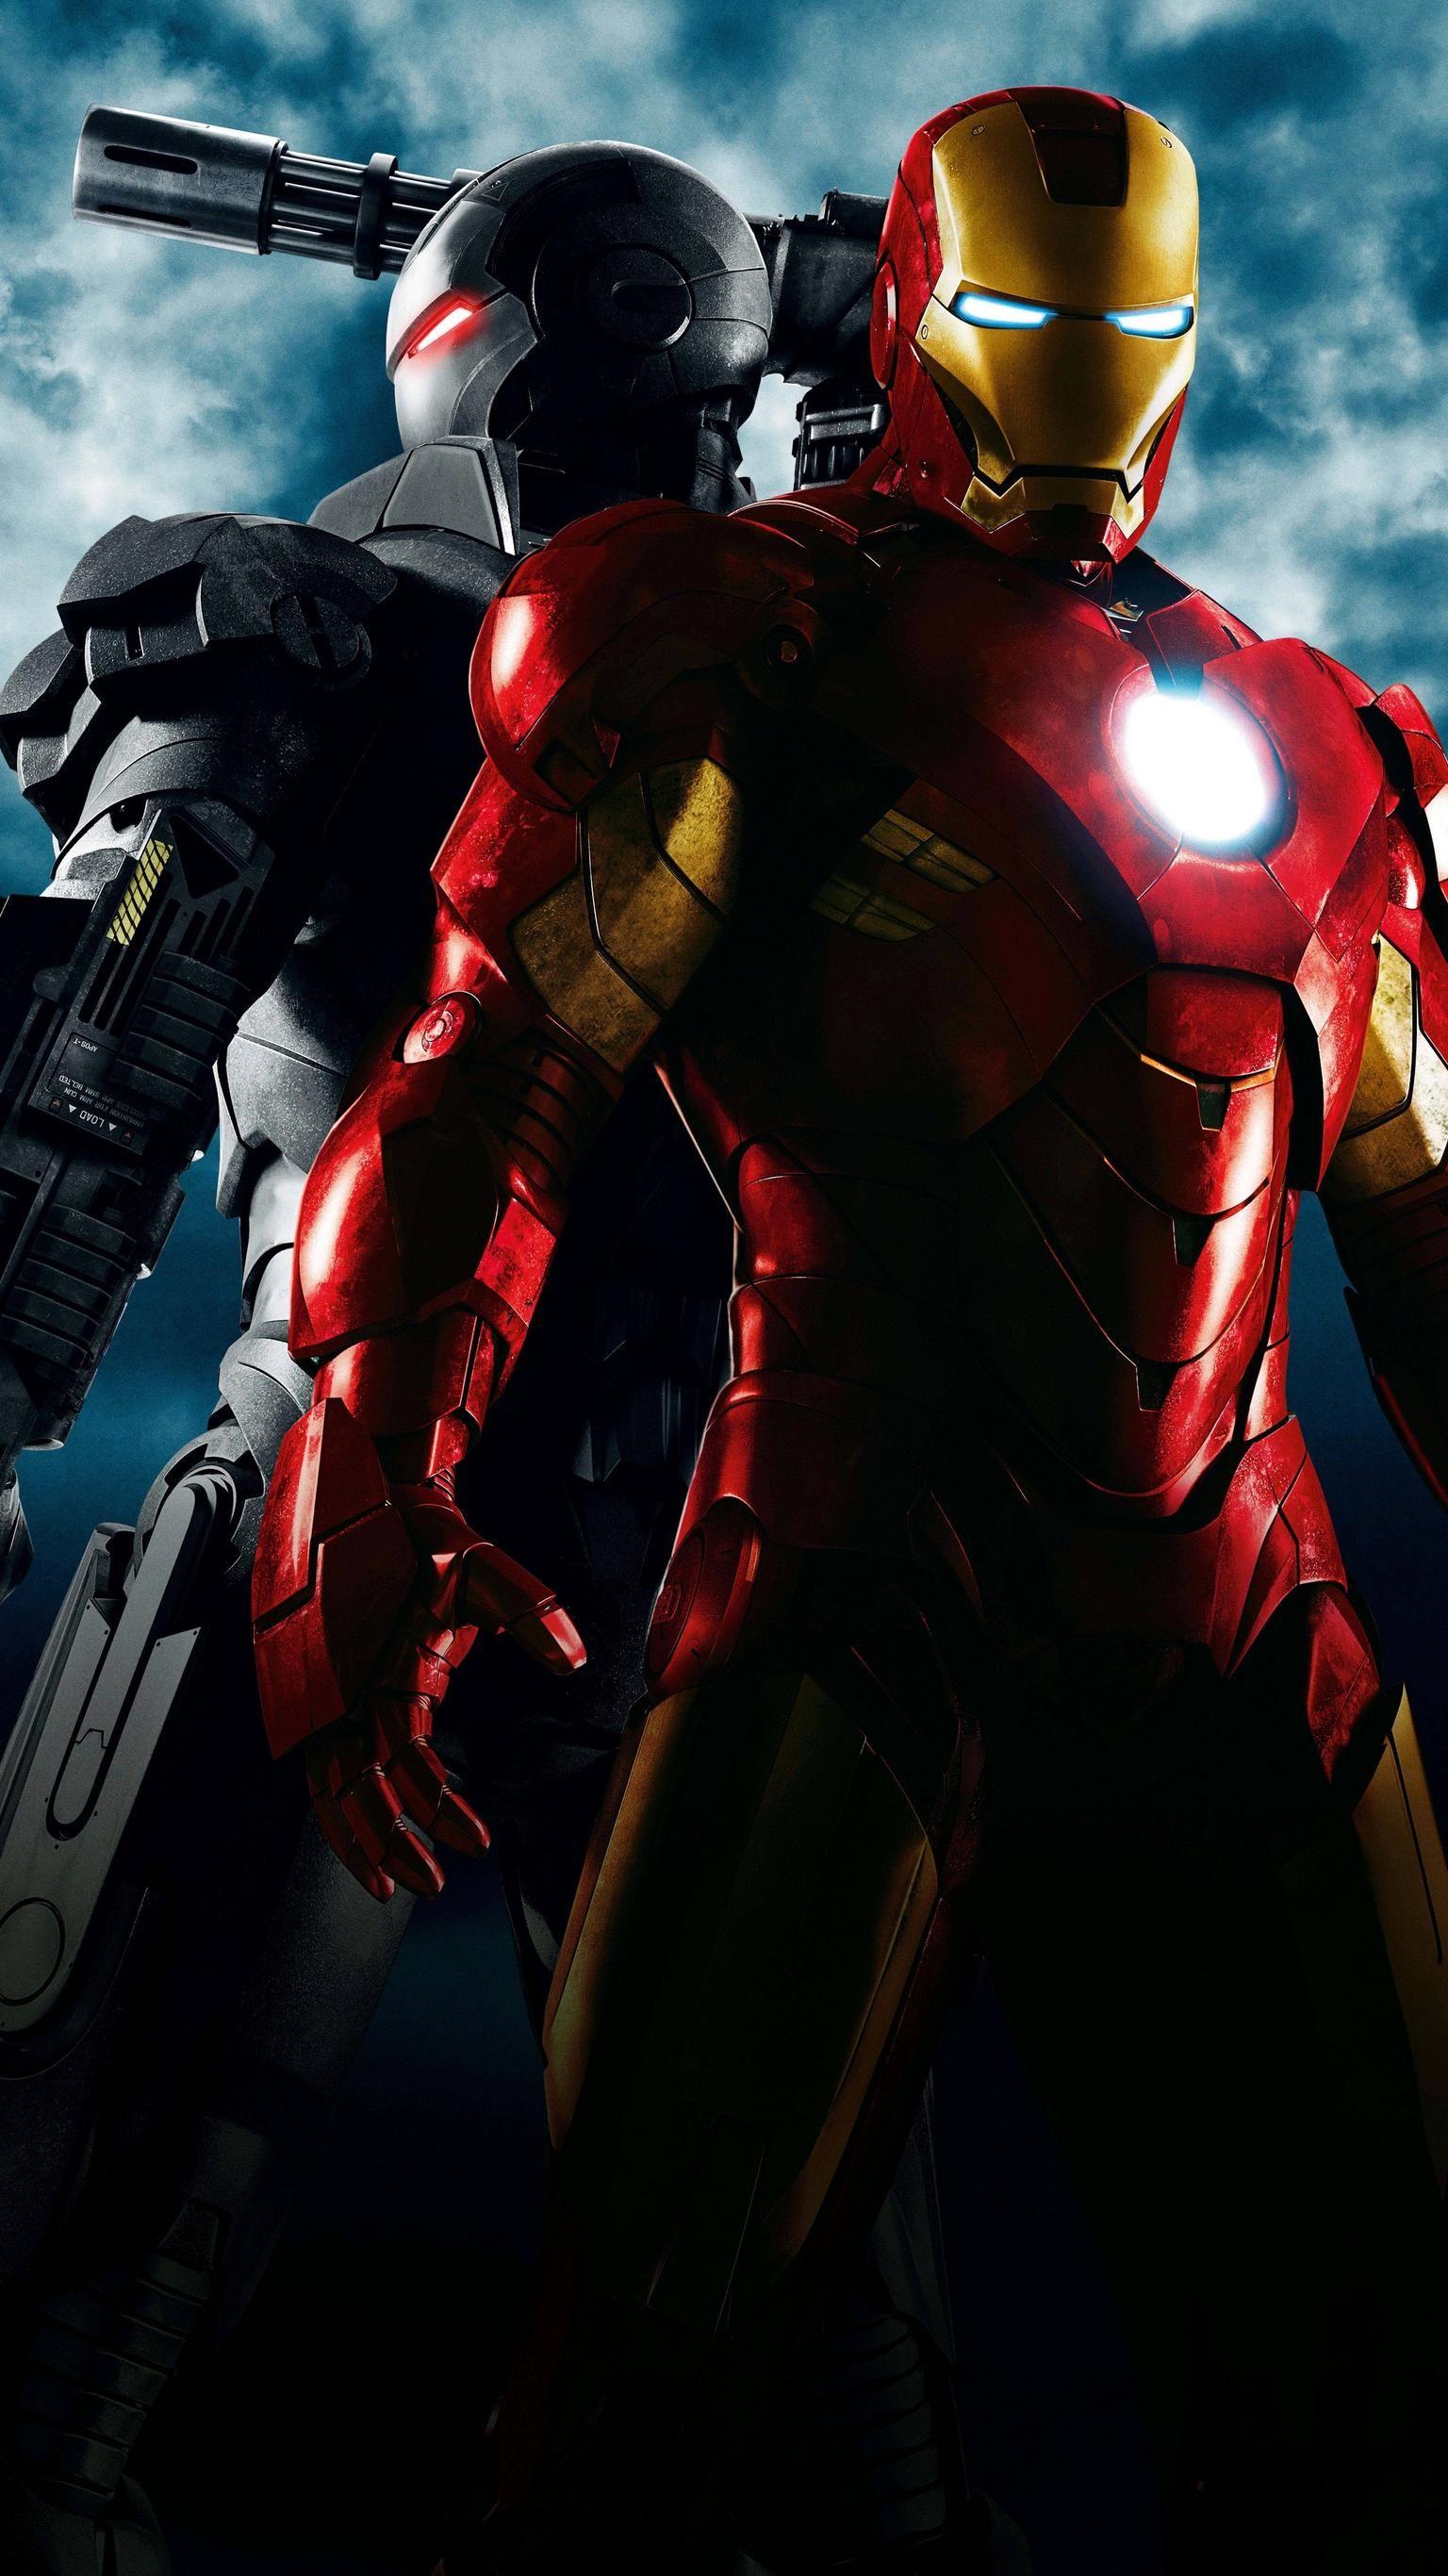 Iron Man 2 2010 Phone Wallpaper Iron Man Wallpaper Iron Man Iron Man Movie